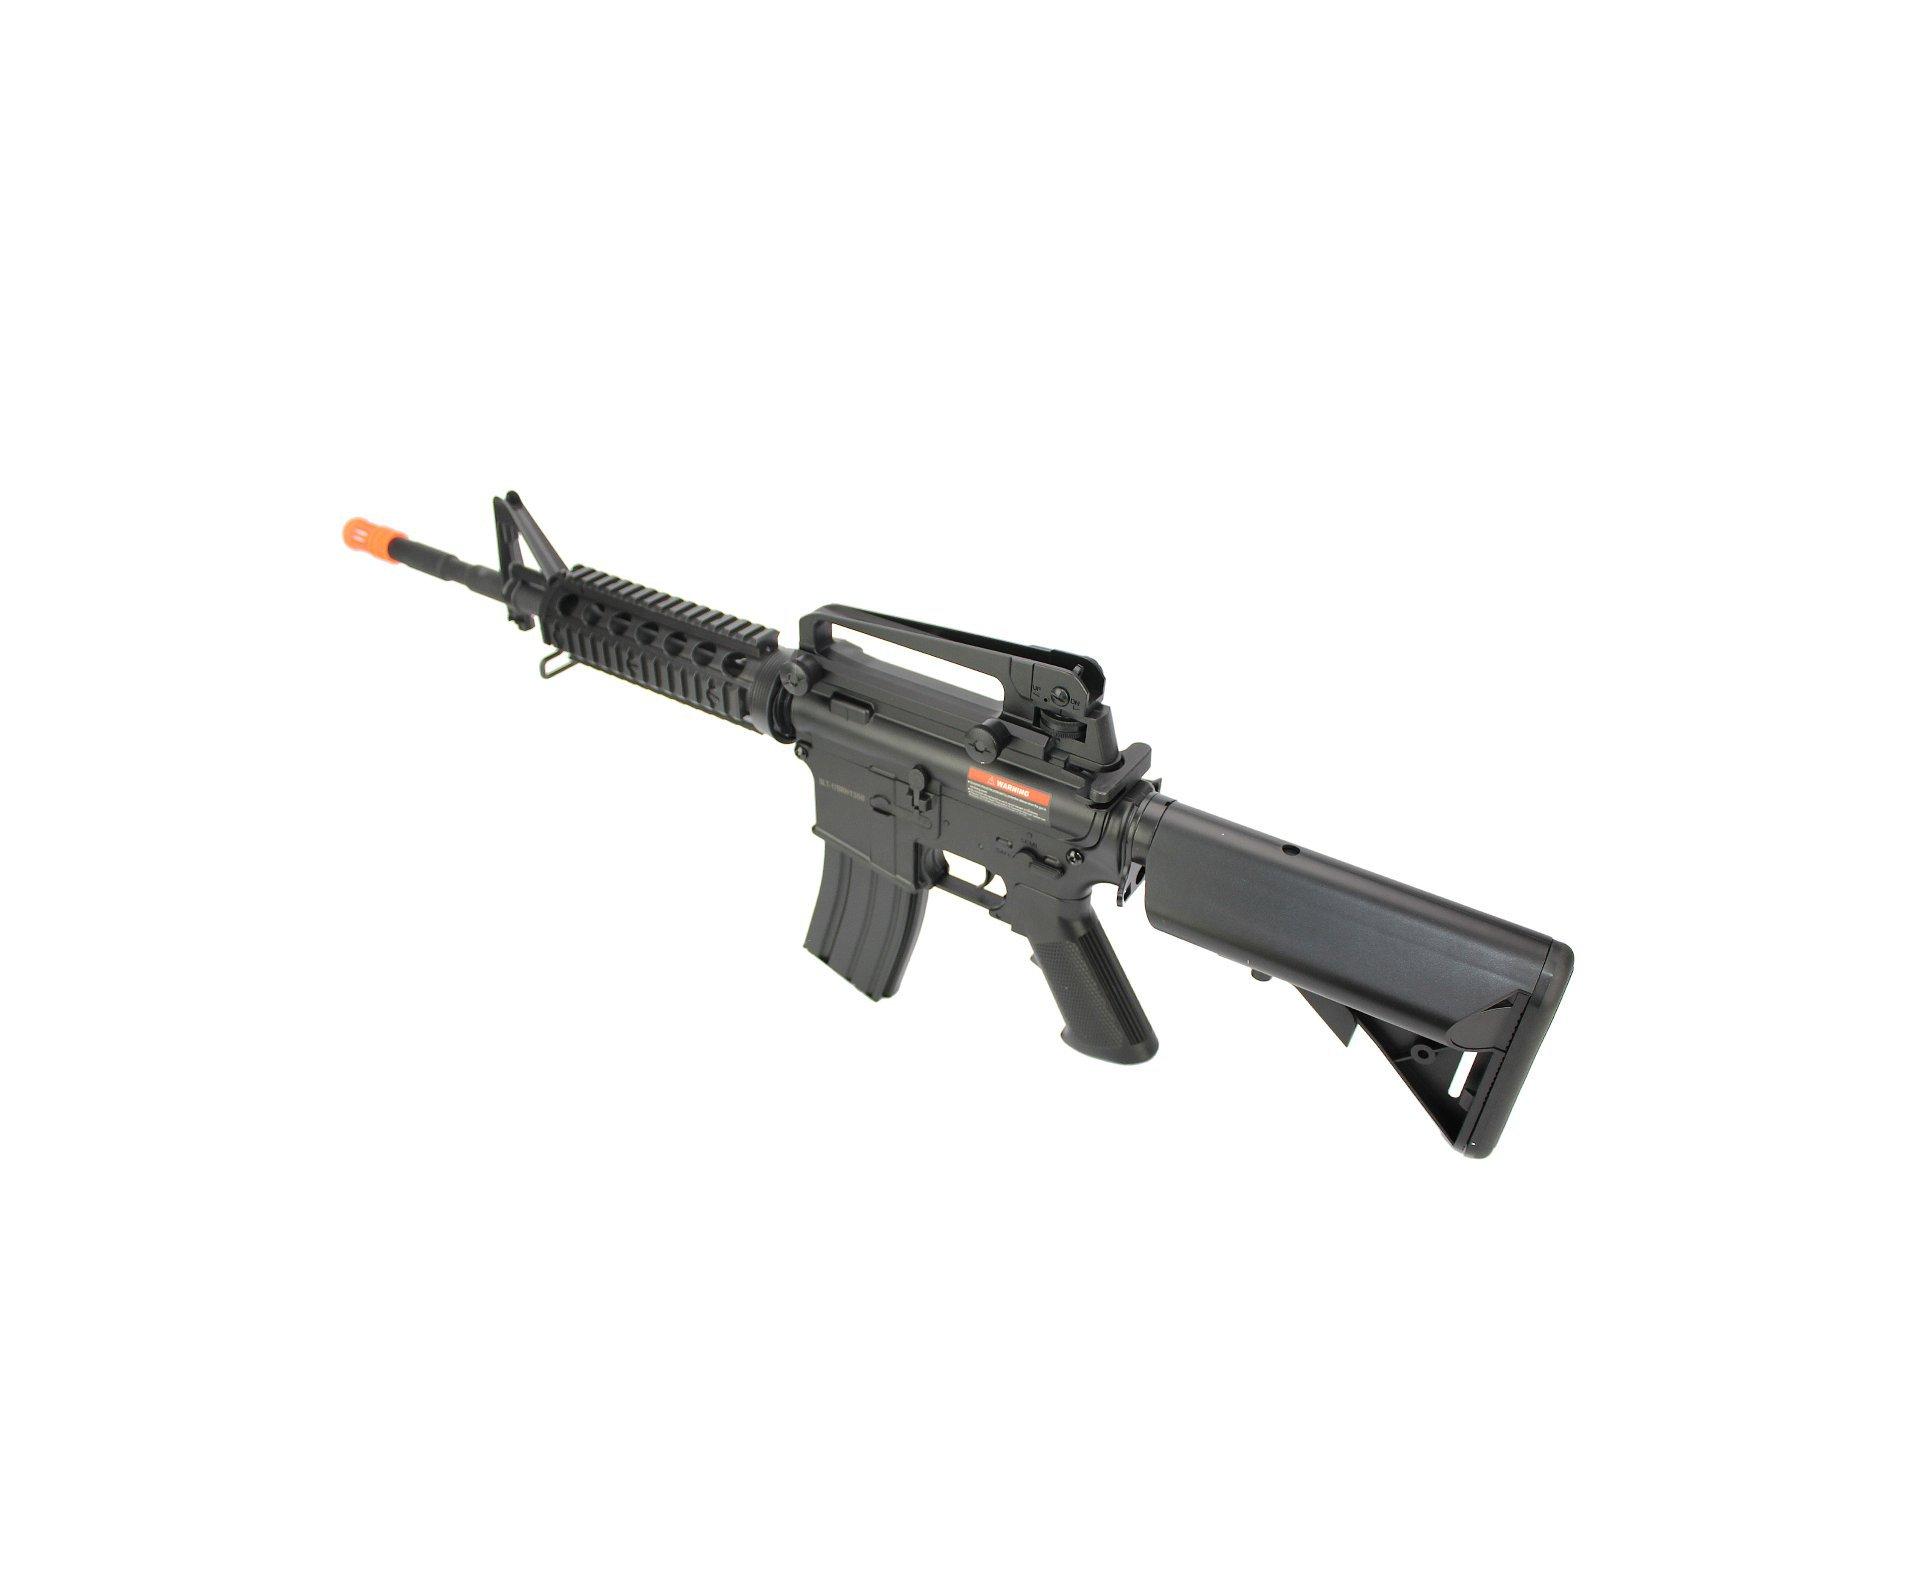 Rifle De Airsoft M4a1 Ris Cm507 Bivolt Cal 6.0mm Cyma